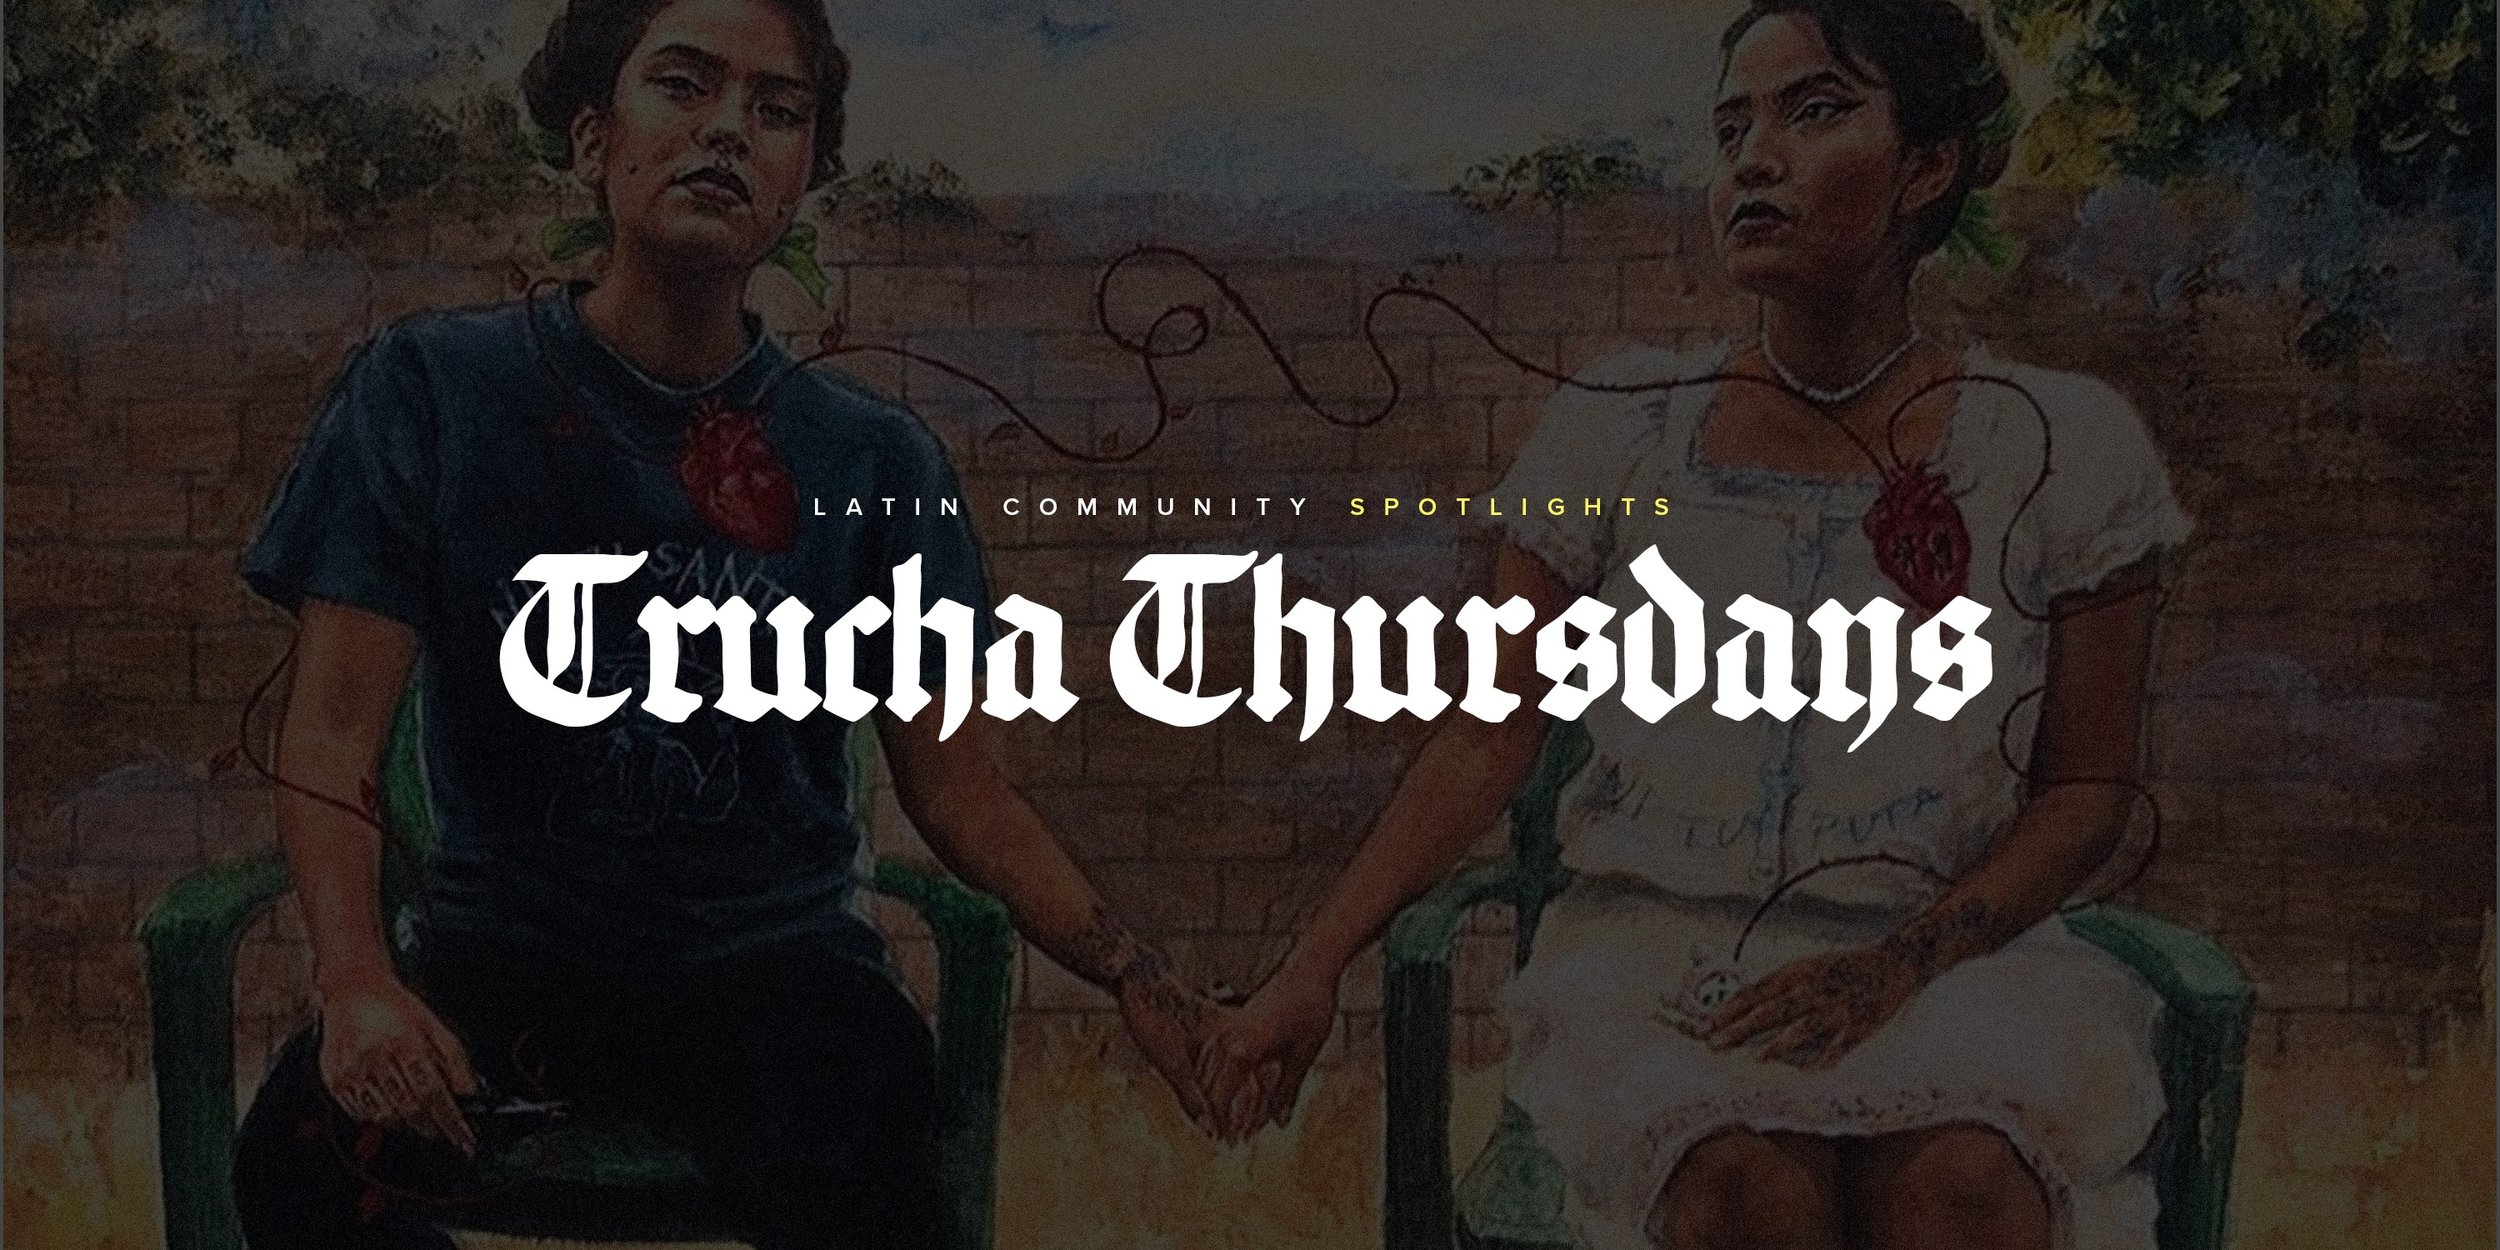 Trucha Thursday-squashed.jpg